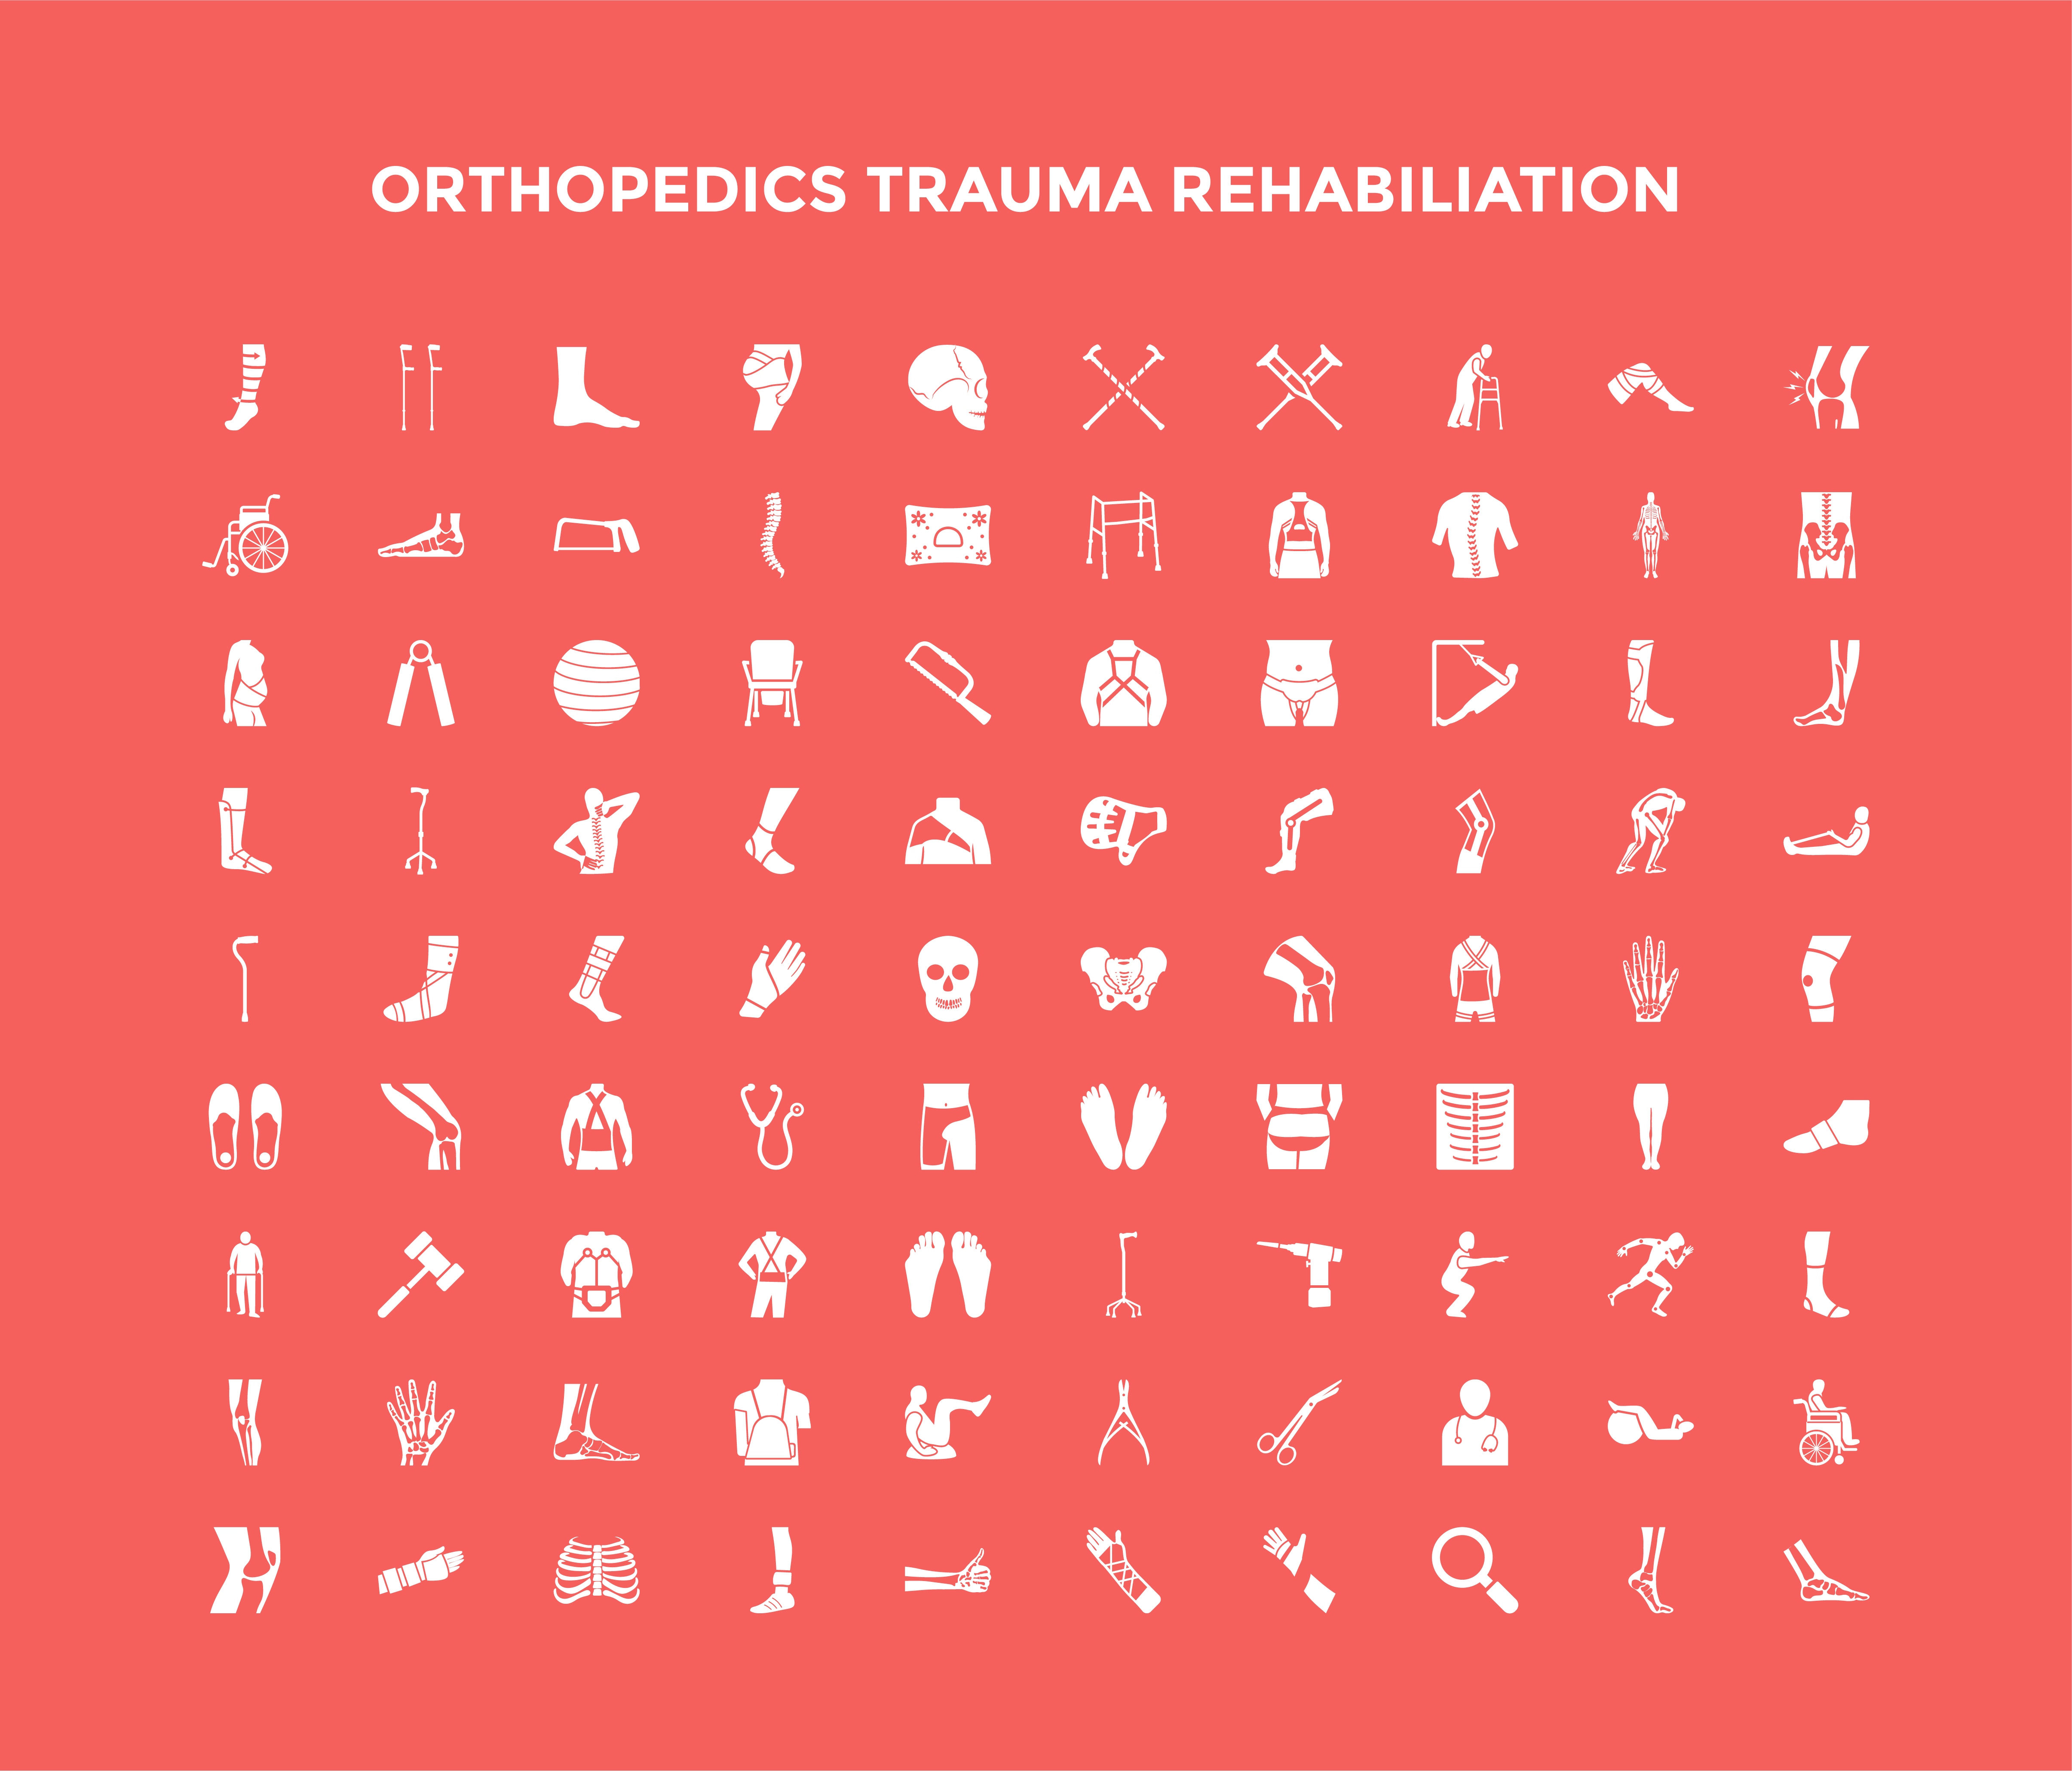 Orthopedic Trauma Rehabilitation Icon Set